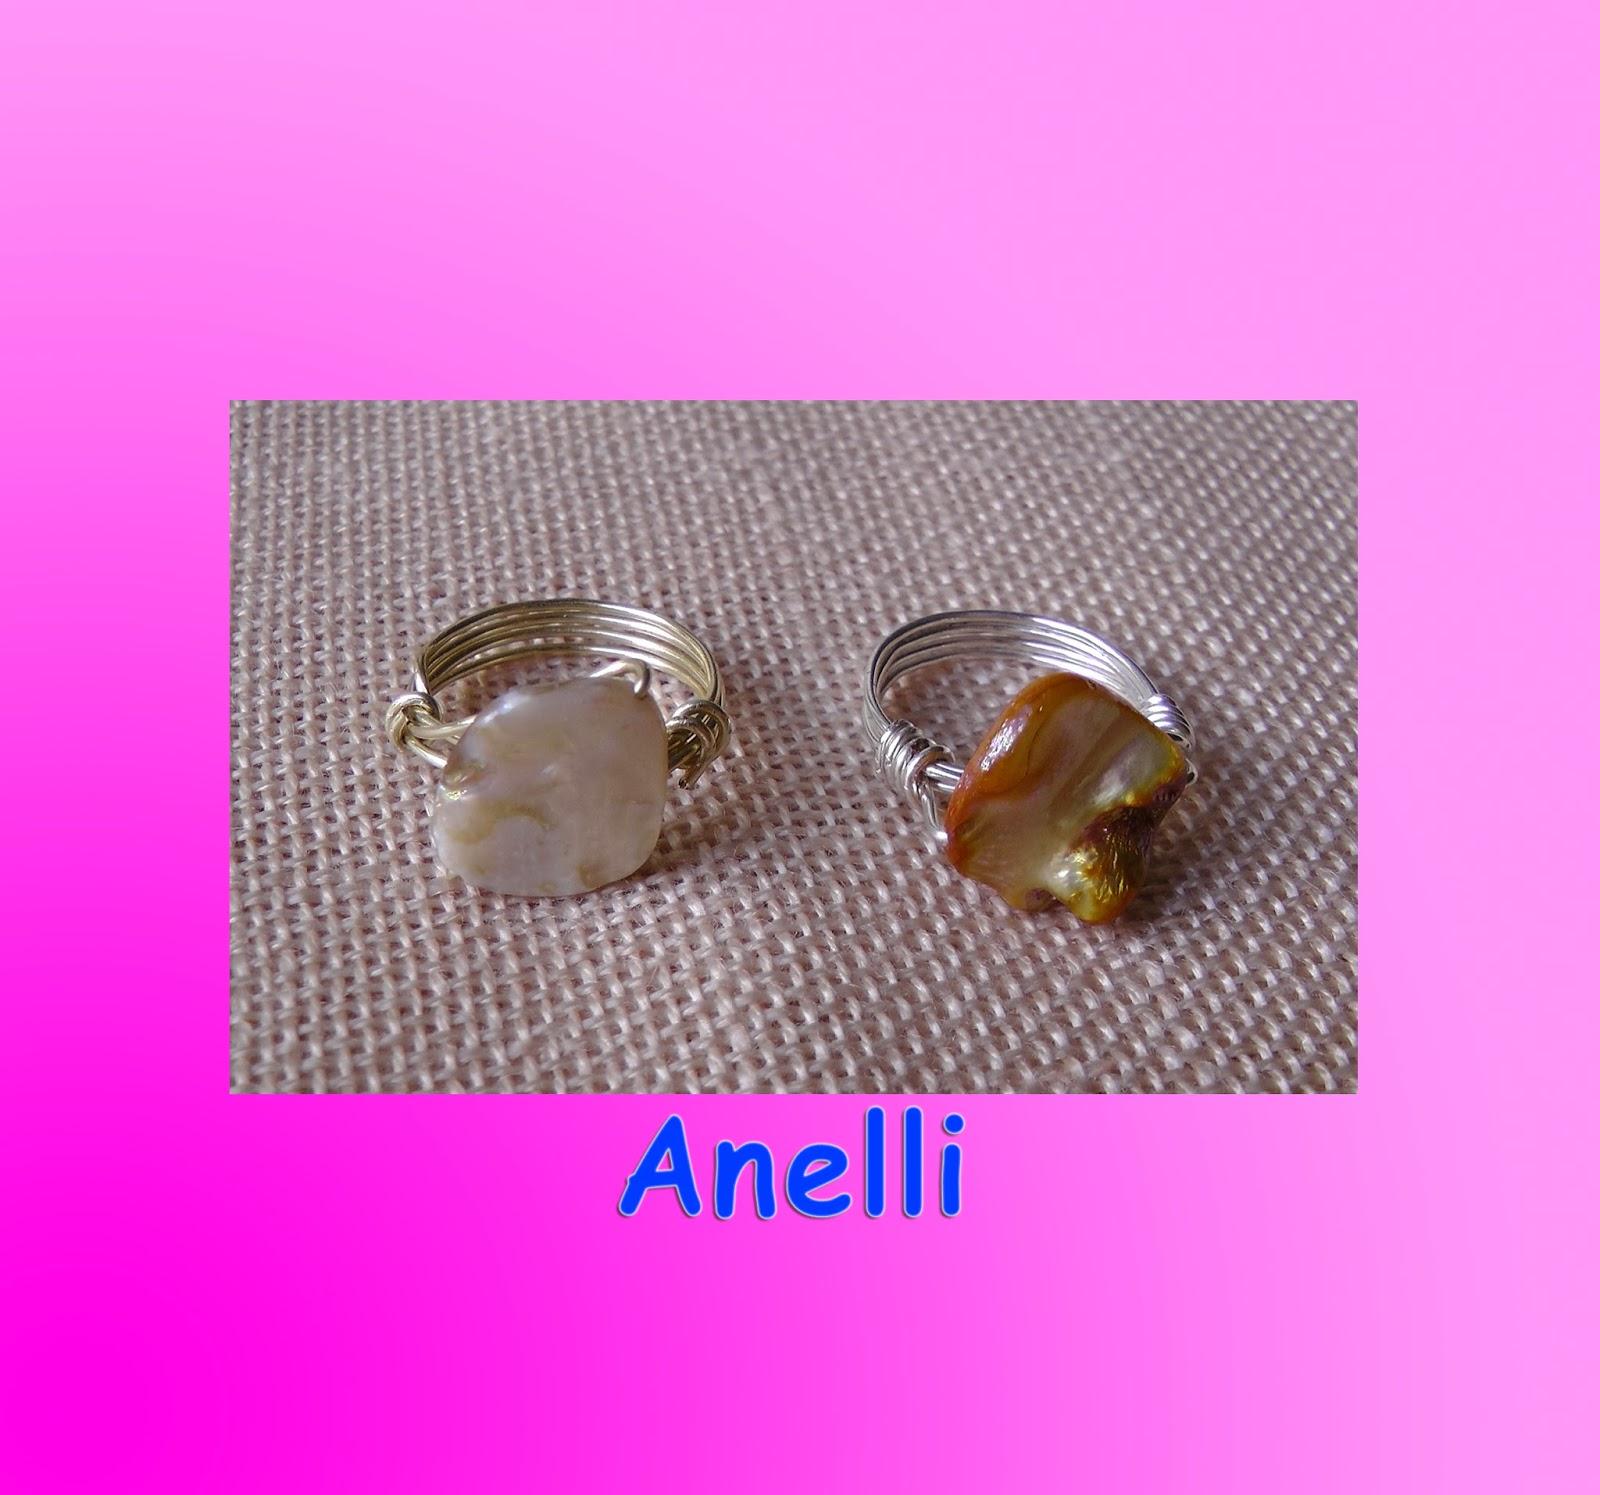 http://adelepasquariello.blogspot.it/2014/03/anelli.html